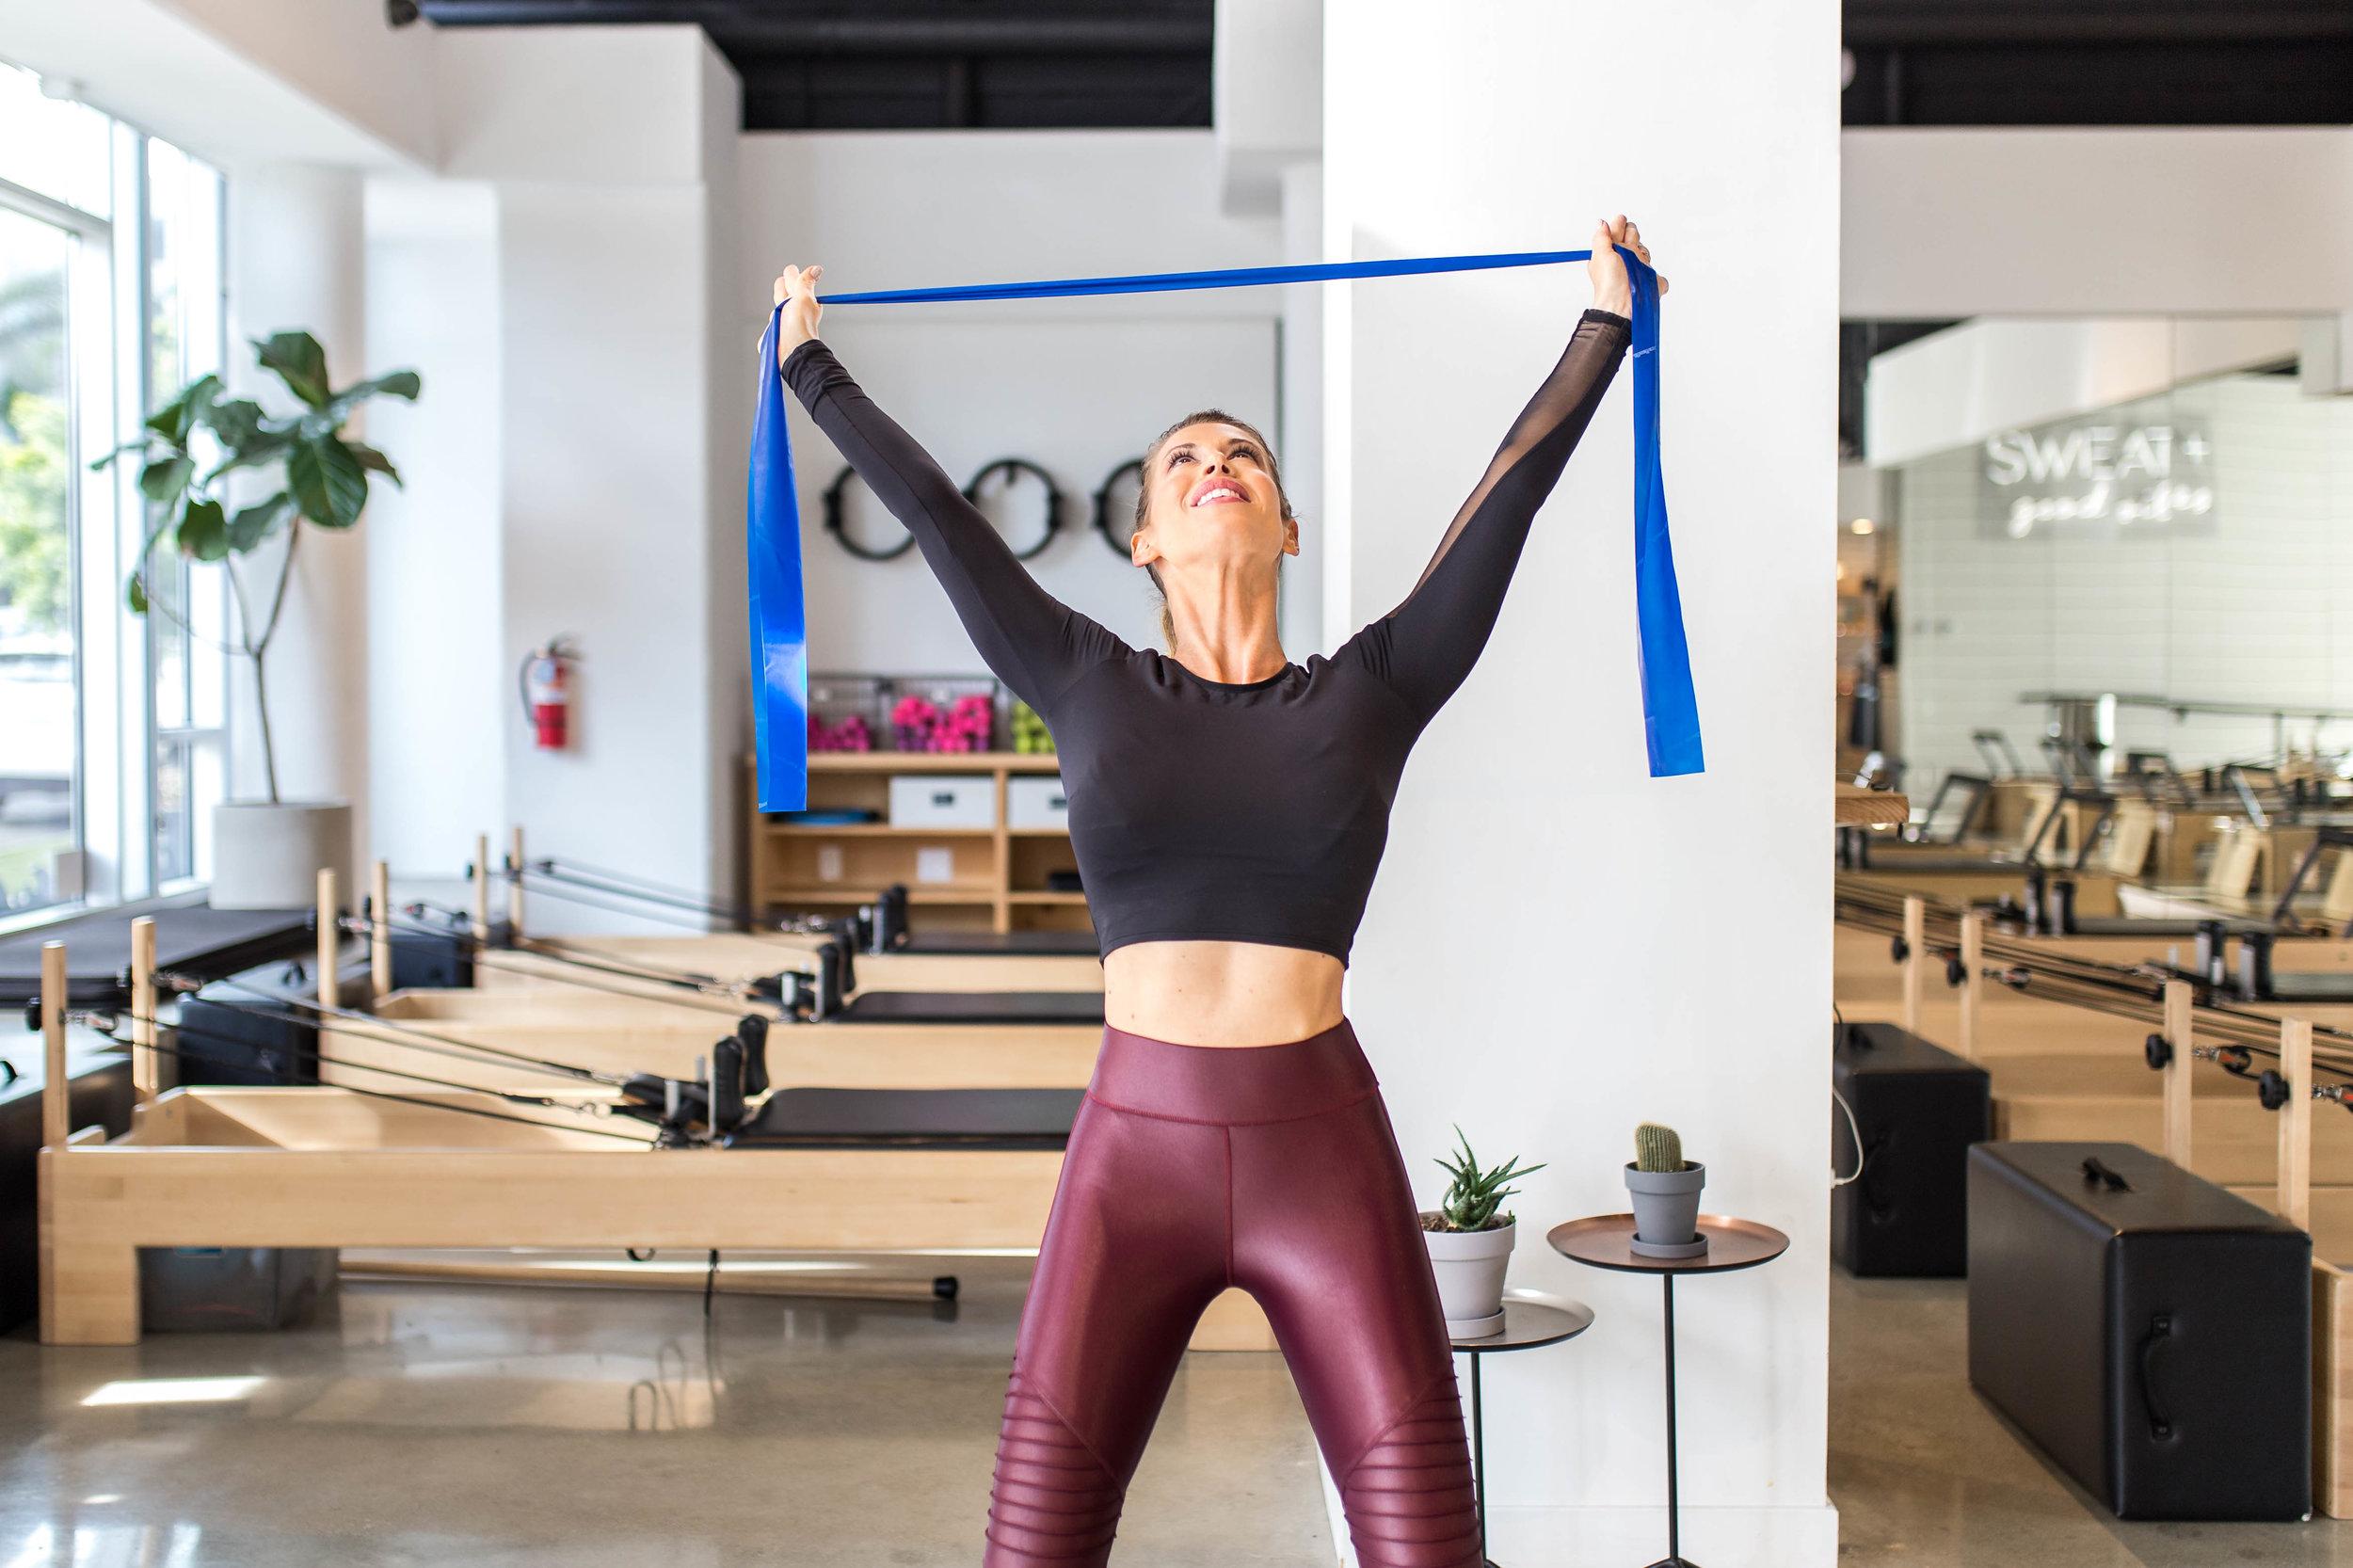 Livestrong_Pilates-13.JPG